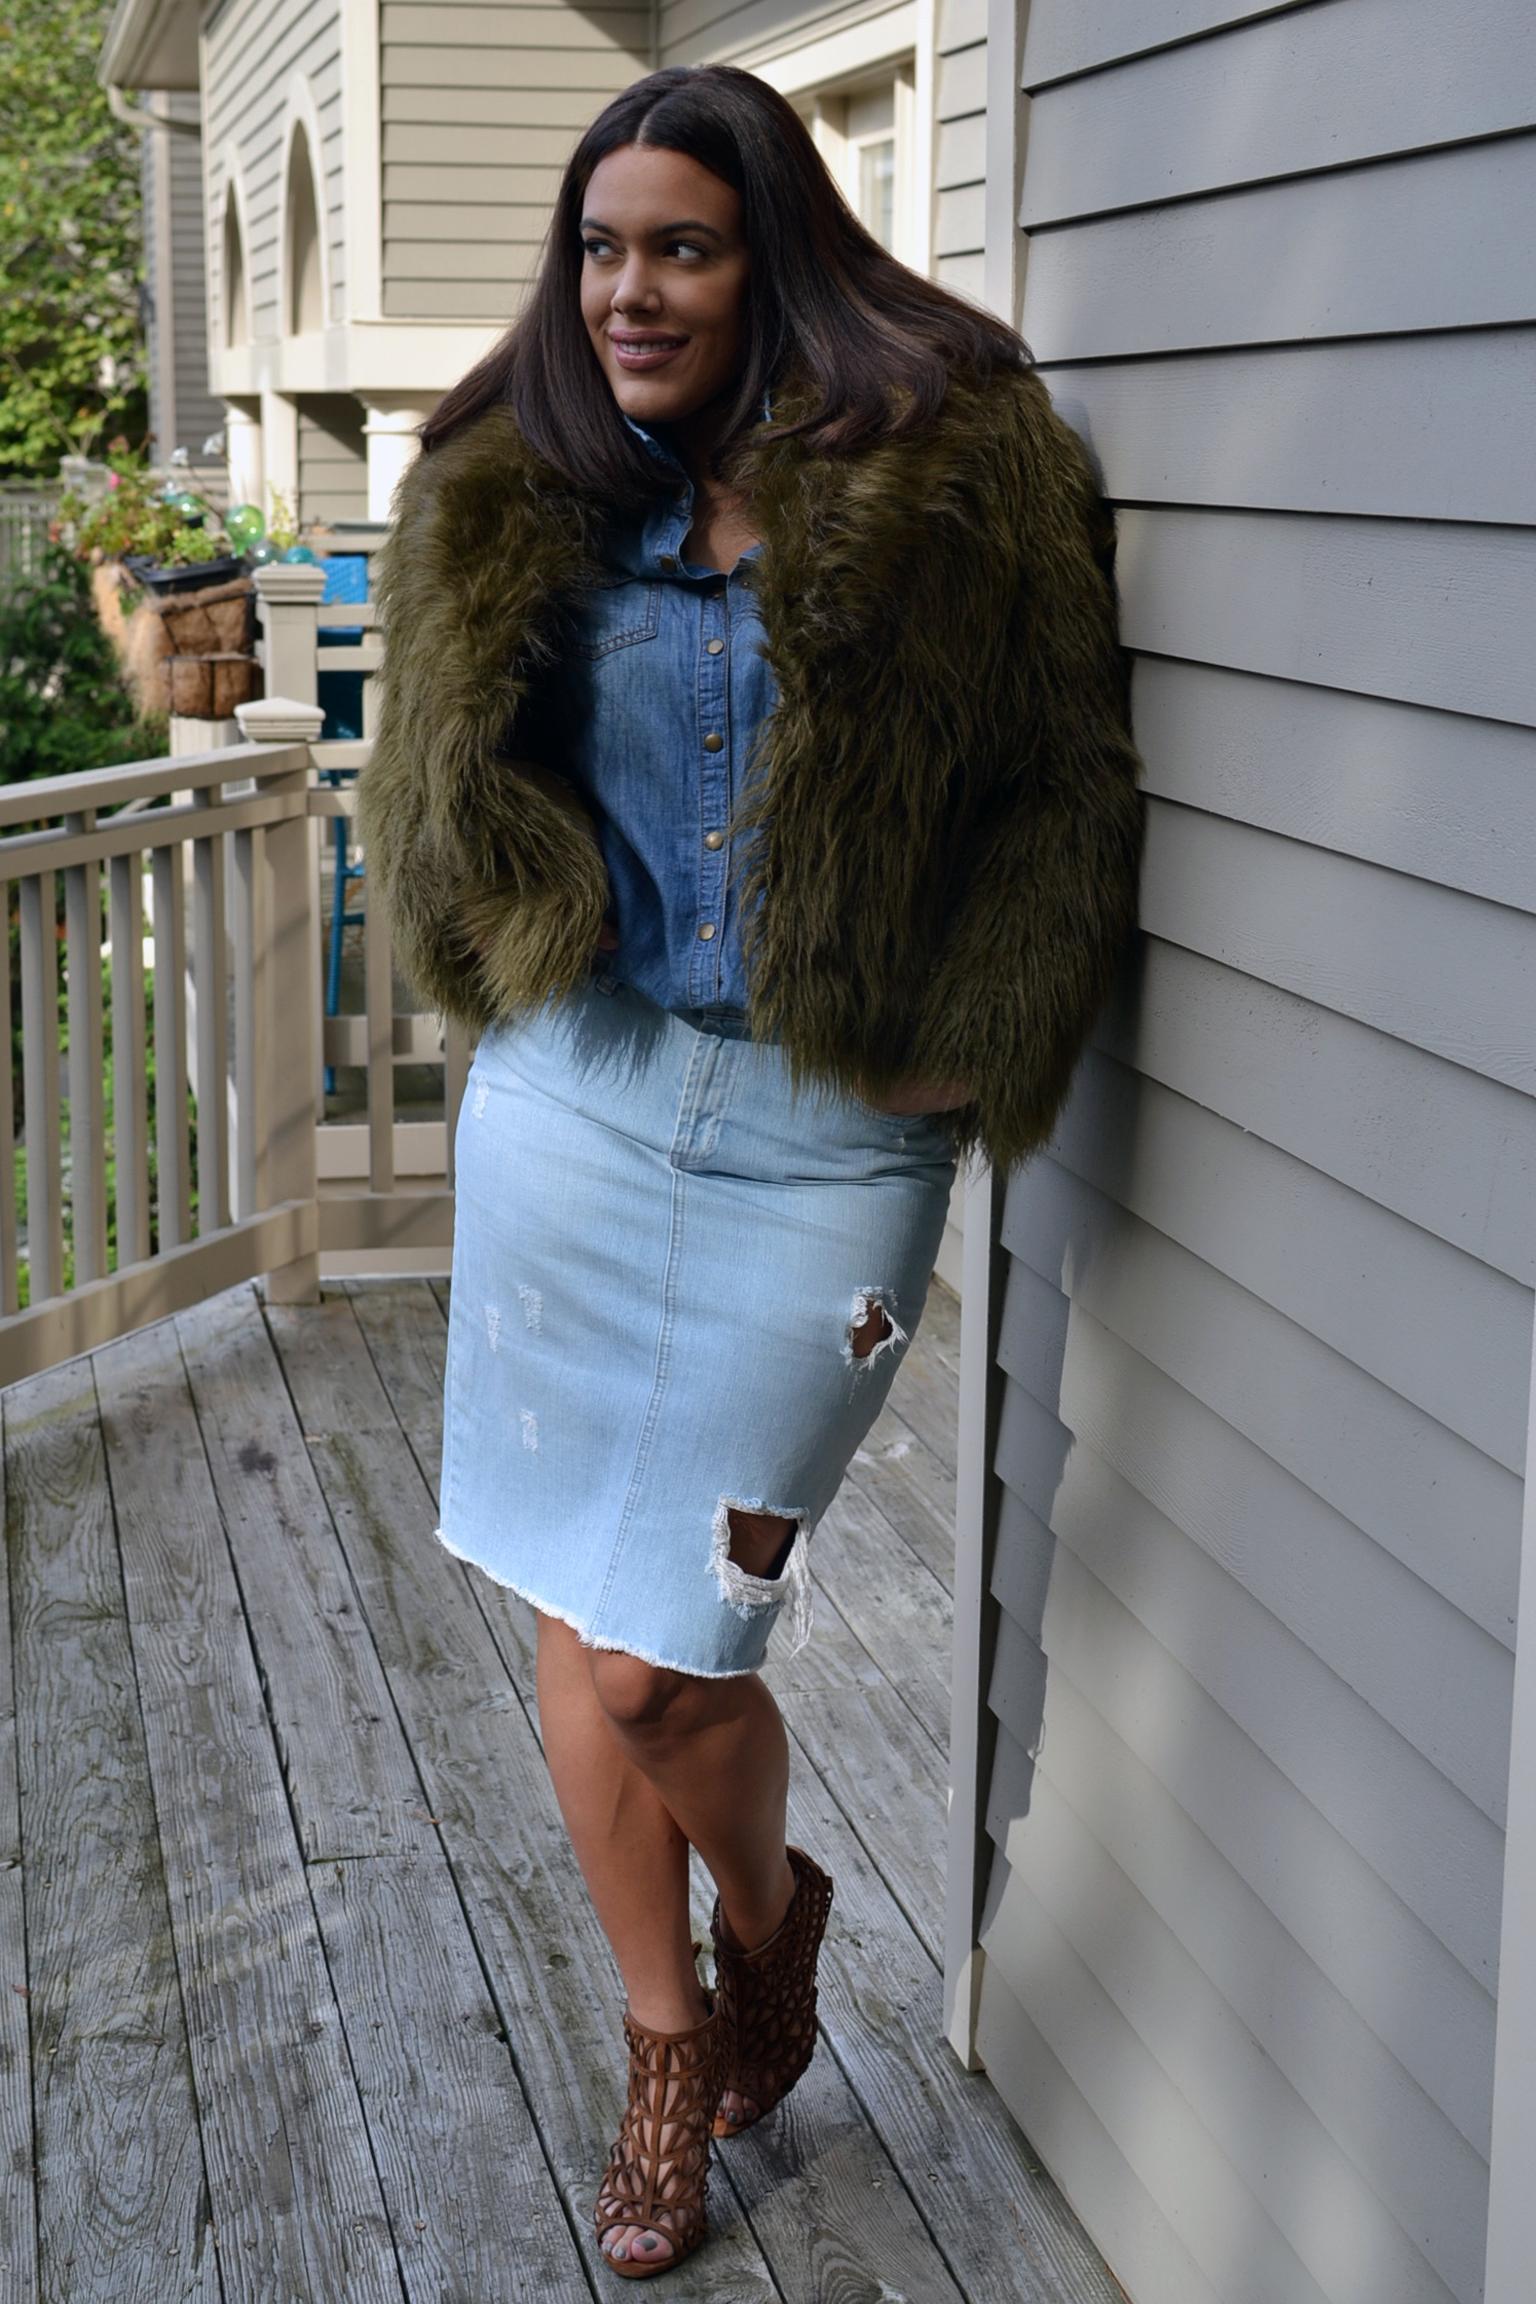 how-to-wear-hm-studio-autumn-winter-aw-14-collection-green-fur-coat-jacket-distressed-denim-skirt-zara-caged-heels-denim-on-denim.jpg